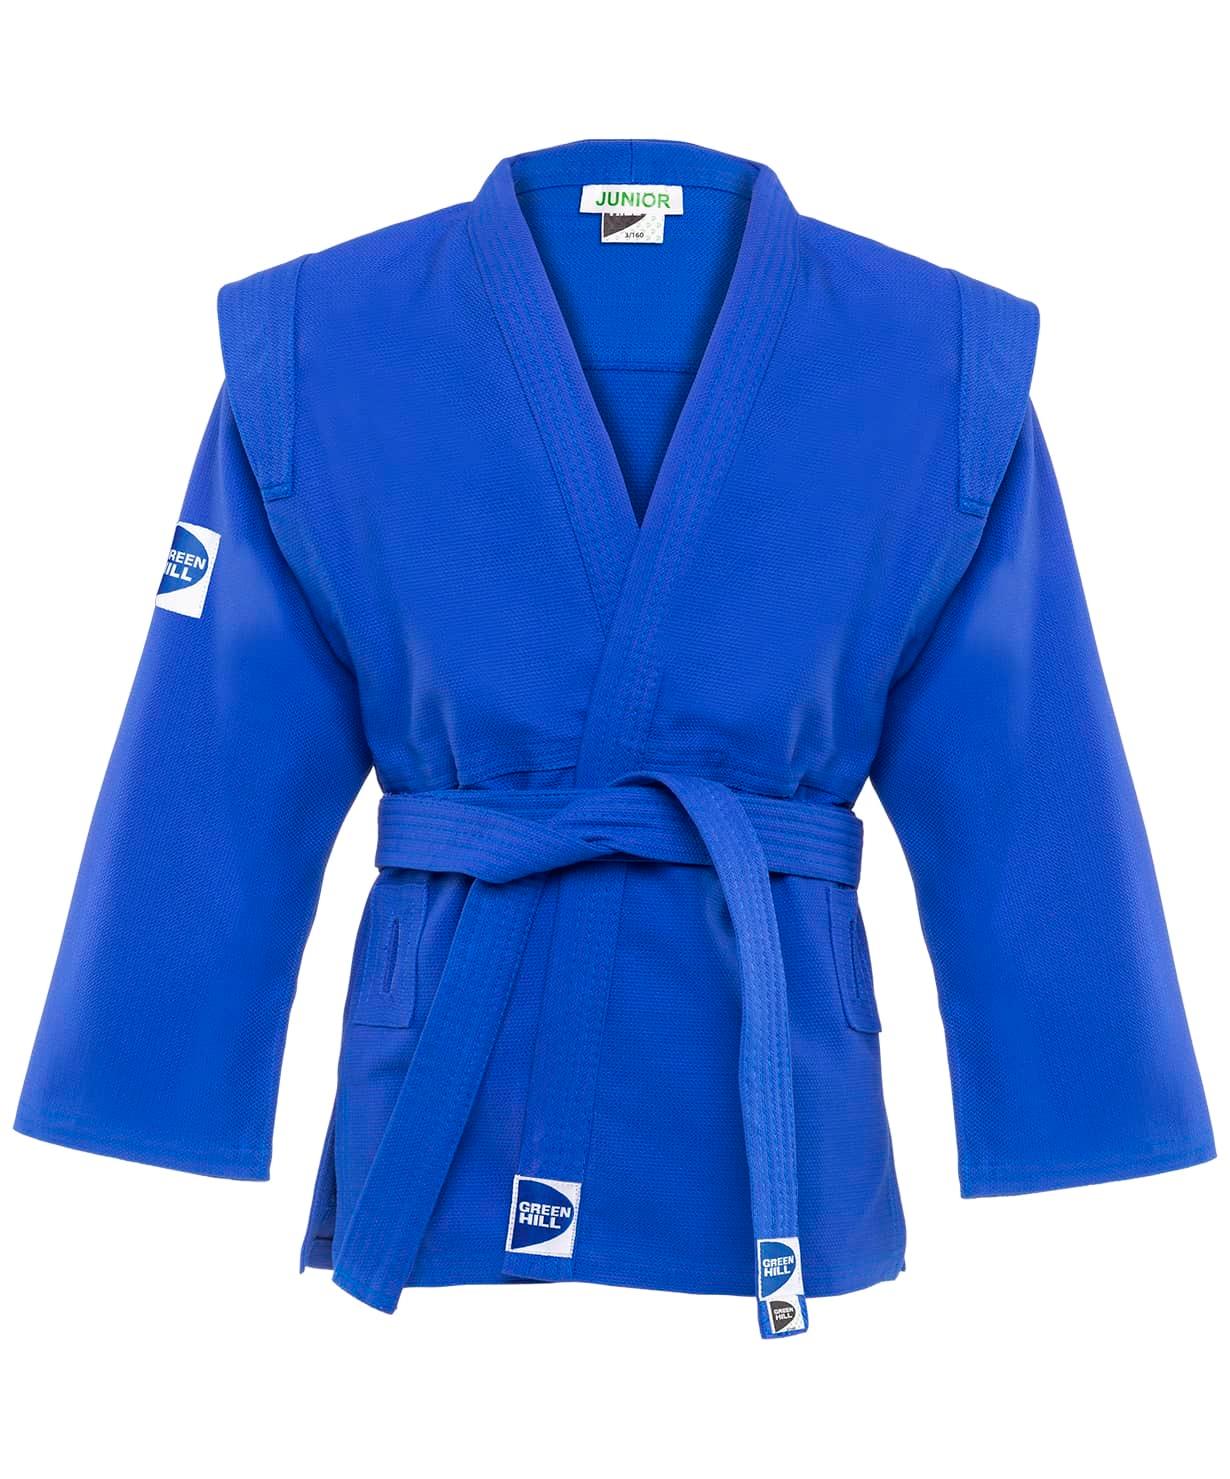 Куртка для самбо Junior SCJ-2201, синий, р.6/190